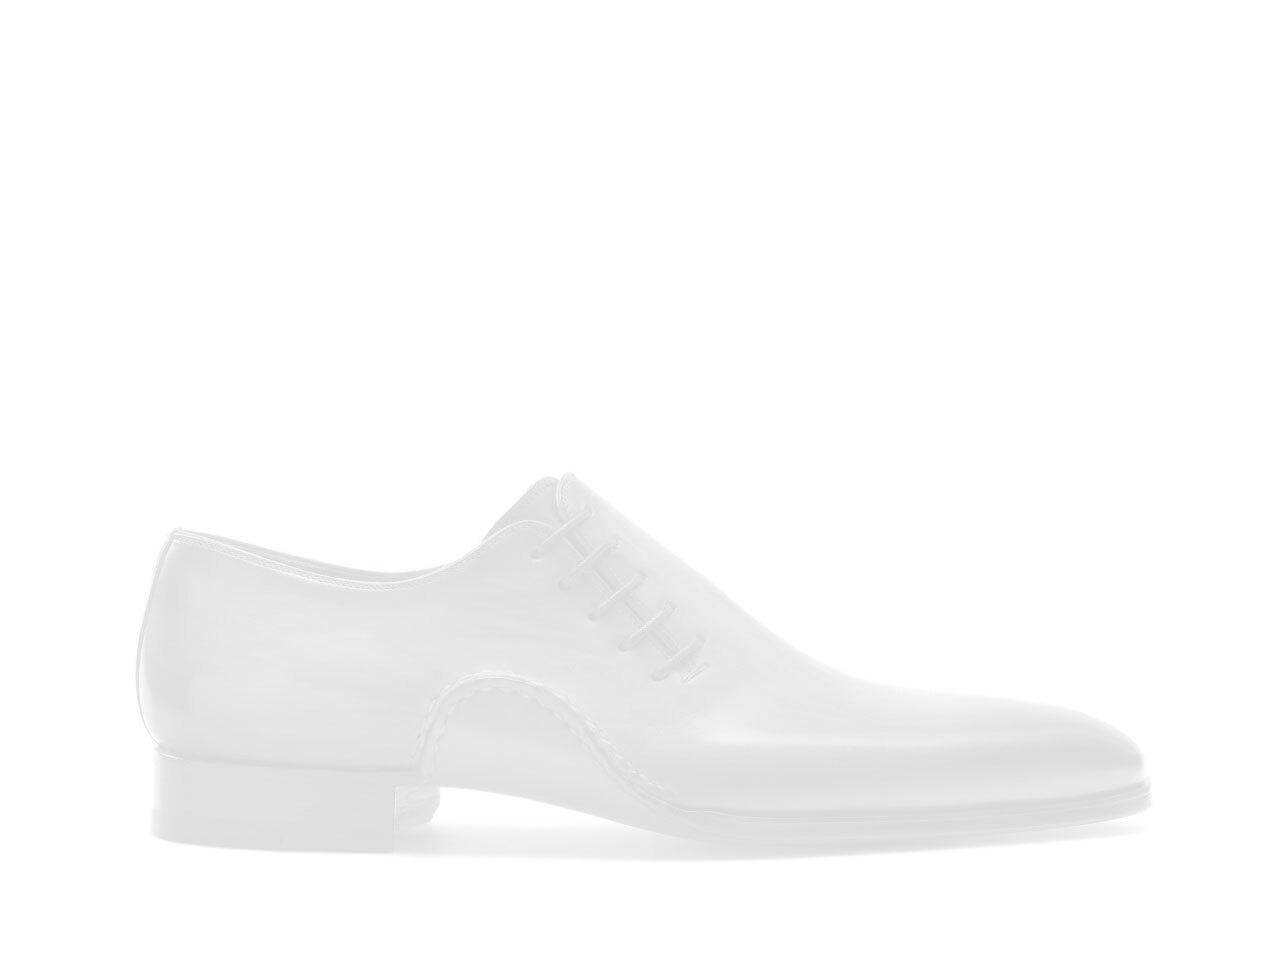 Sole of the Magnanni Lennon Grey Men's Single Monk Strap Shoes